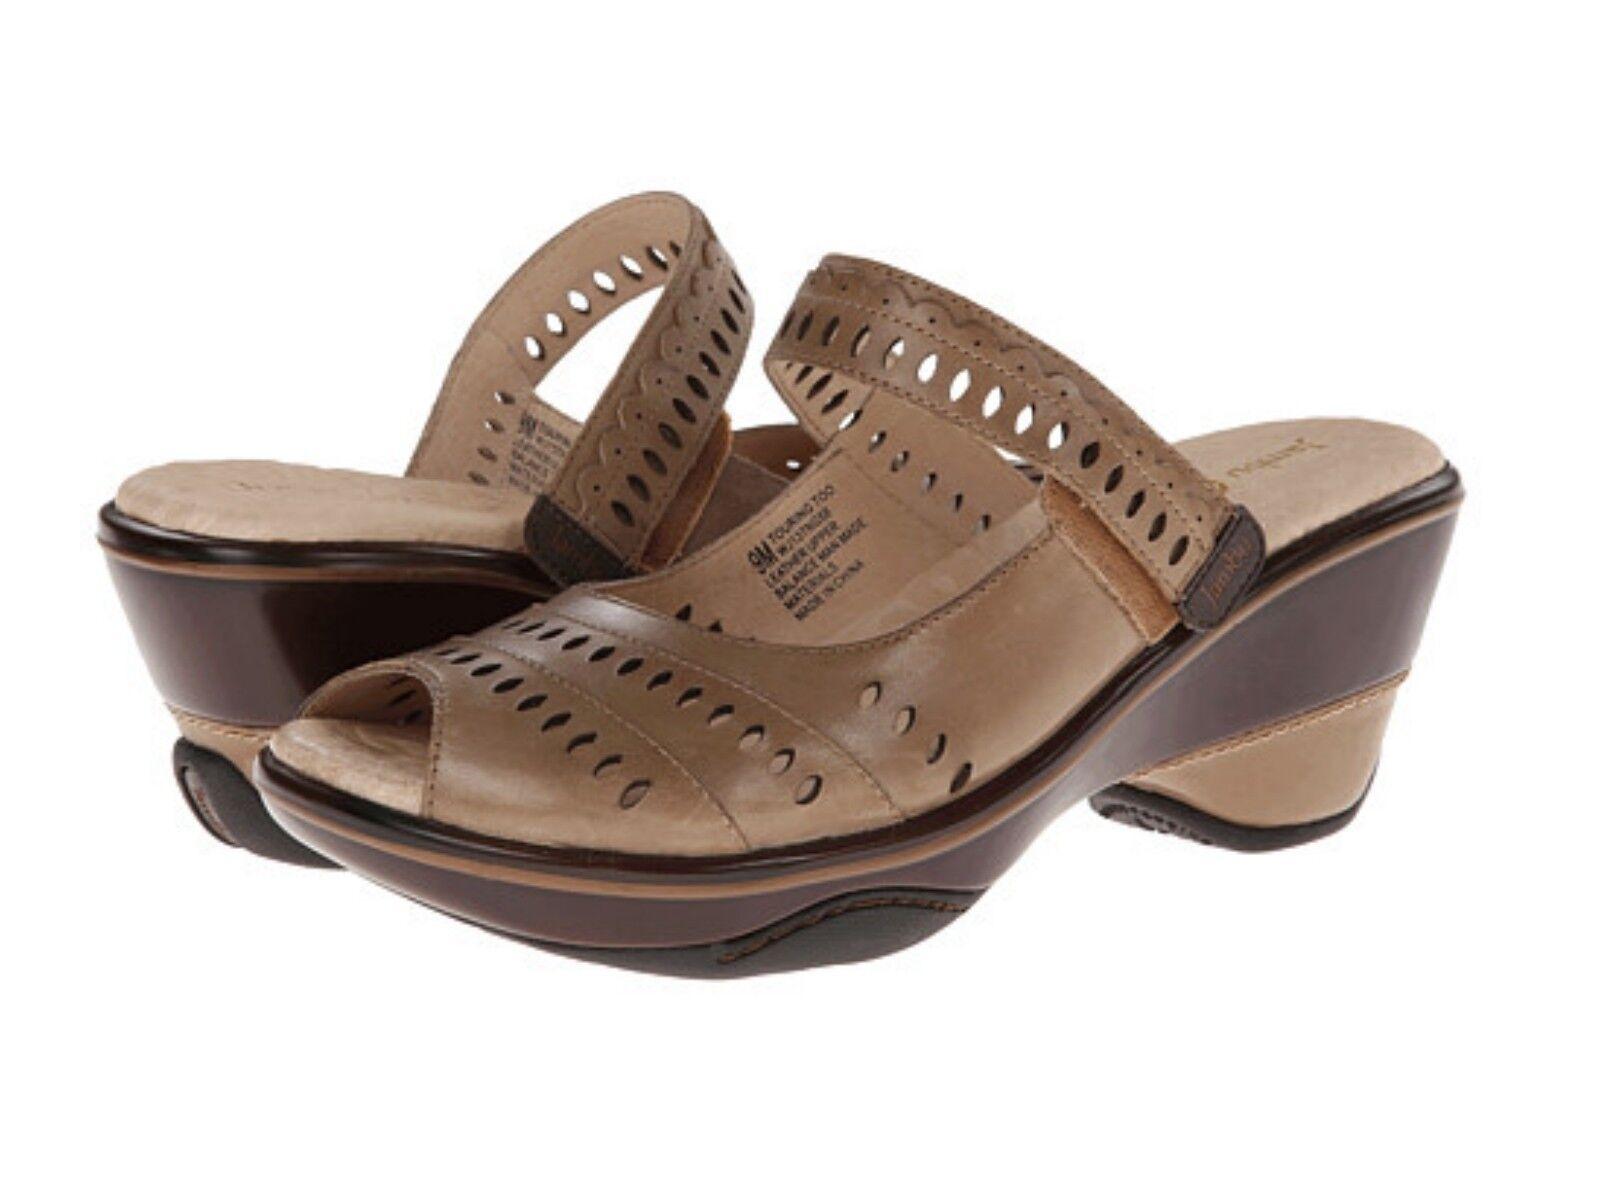 New Damens Braun Jambu Touring Too Wedge  Heel Peep Toe Sandale Schuhe 7.5 8 9 10 11